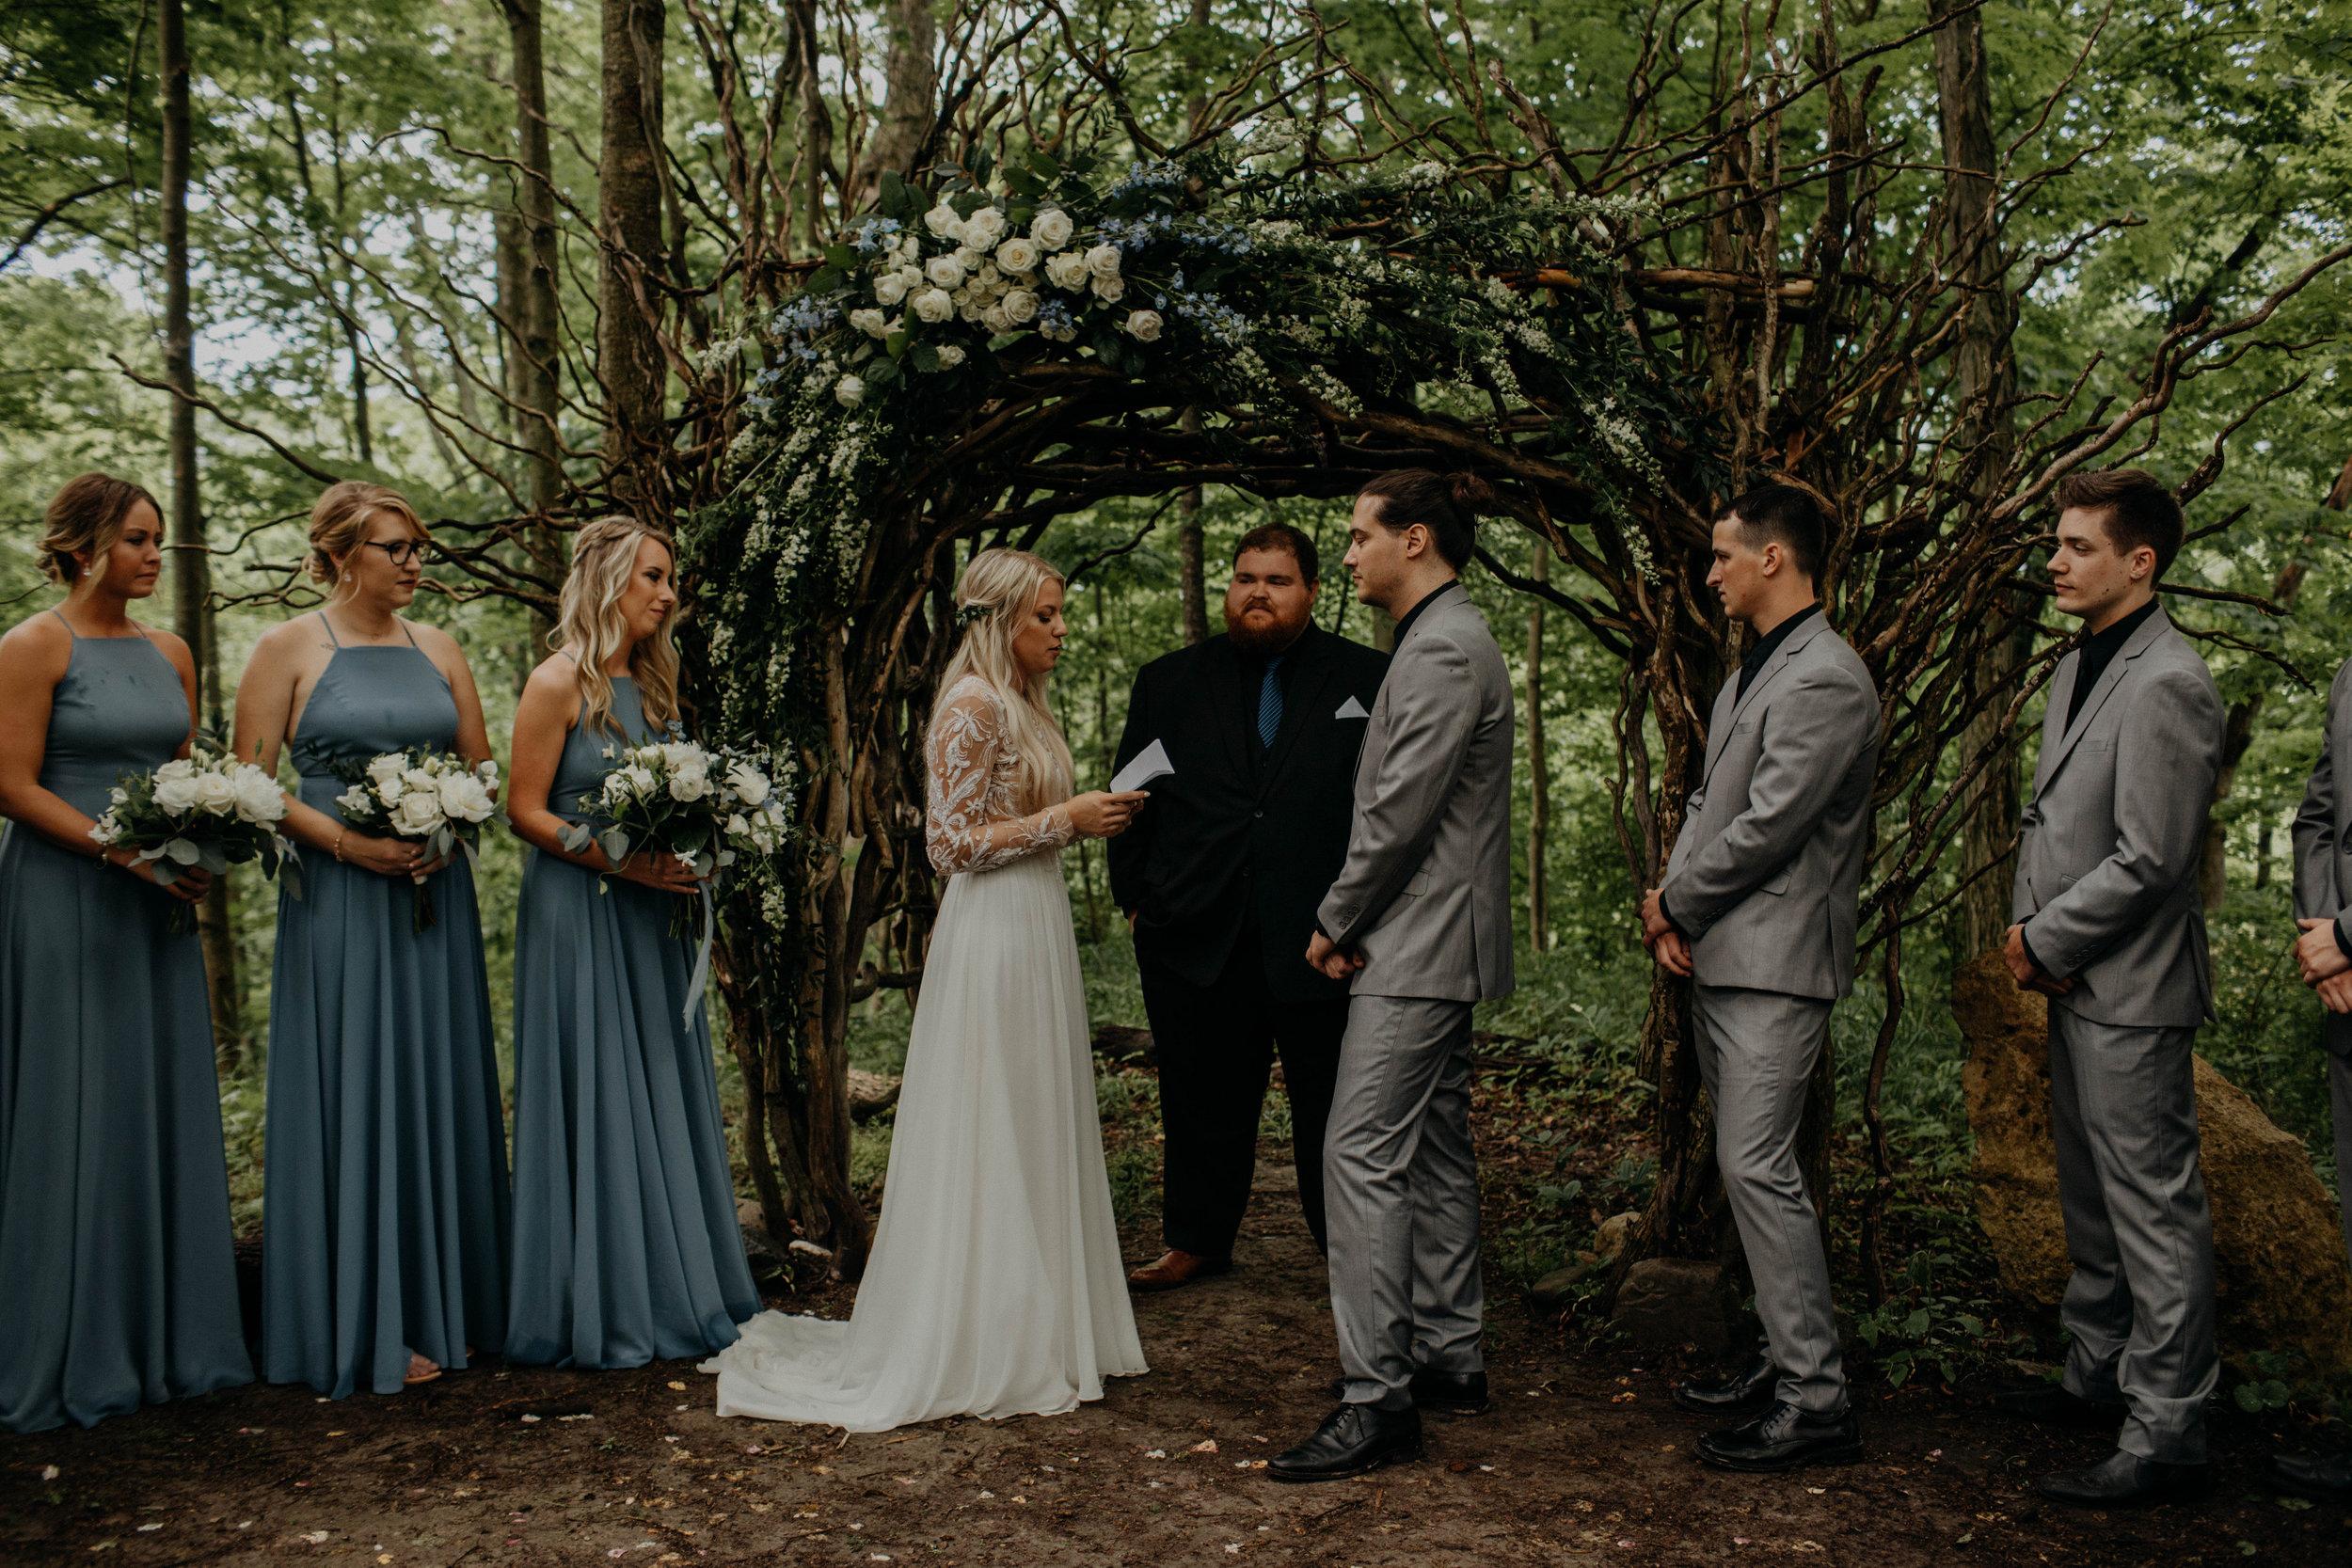 Columbus ohio wedding photographer canyon run ranch wedding grace e jones photography wedding photographer92.jpg